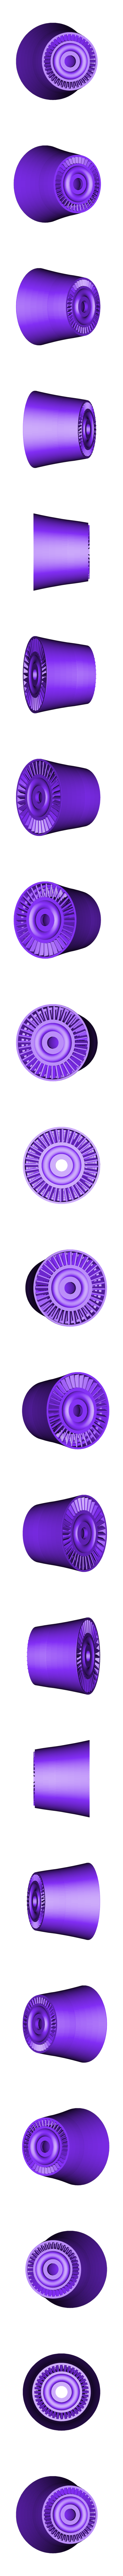 IPC-Rotor101ws.stl Download free STL file Jet Engine, 3-Spool • 3D printable object, konchan77